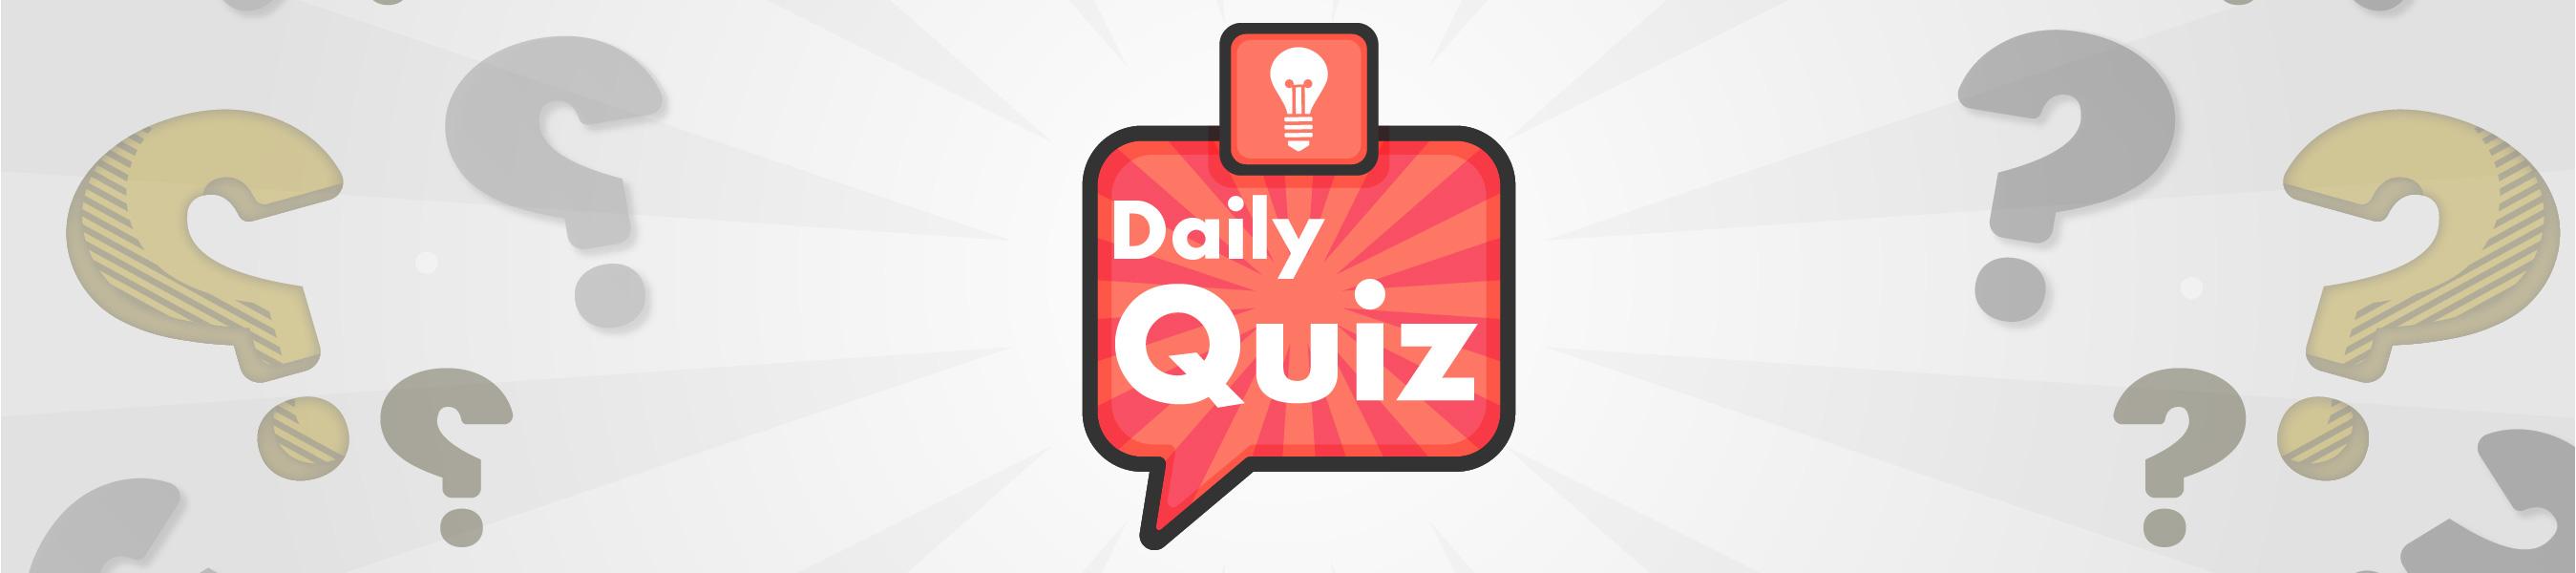 Daily Quiz banner